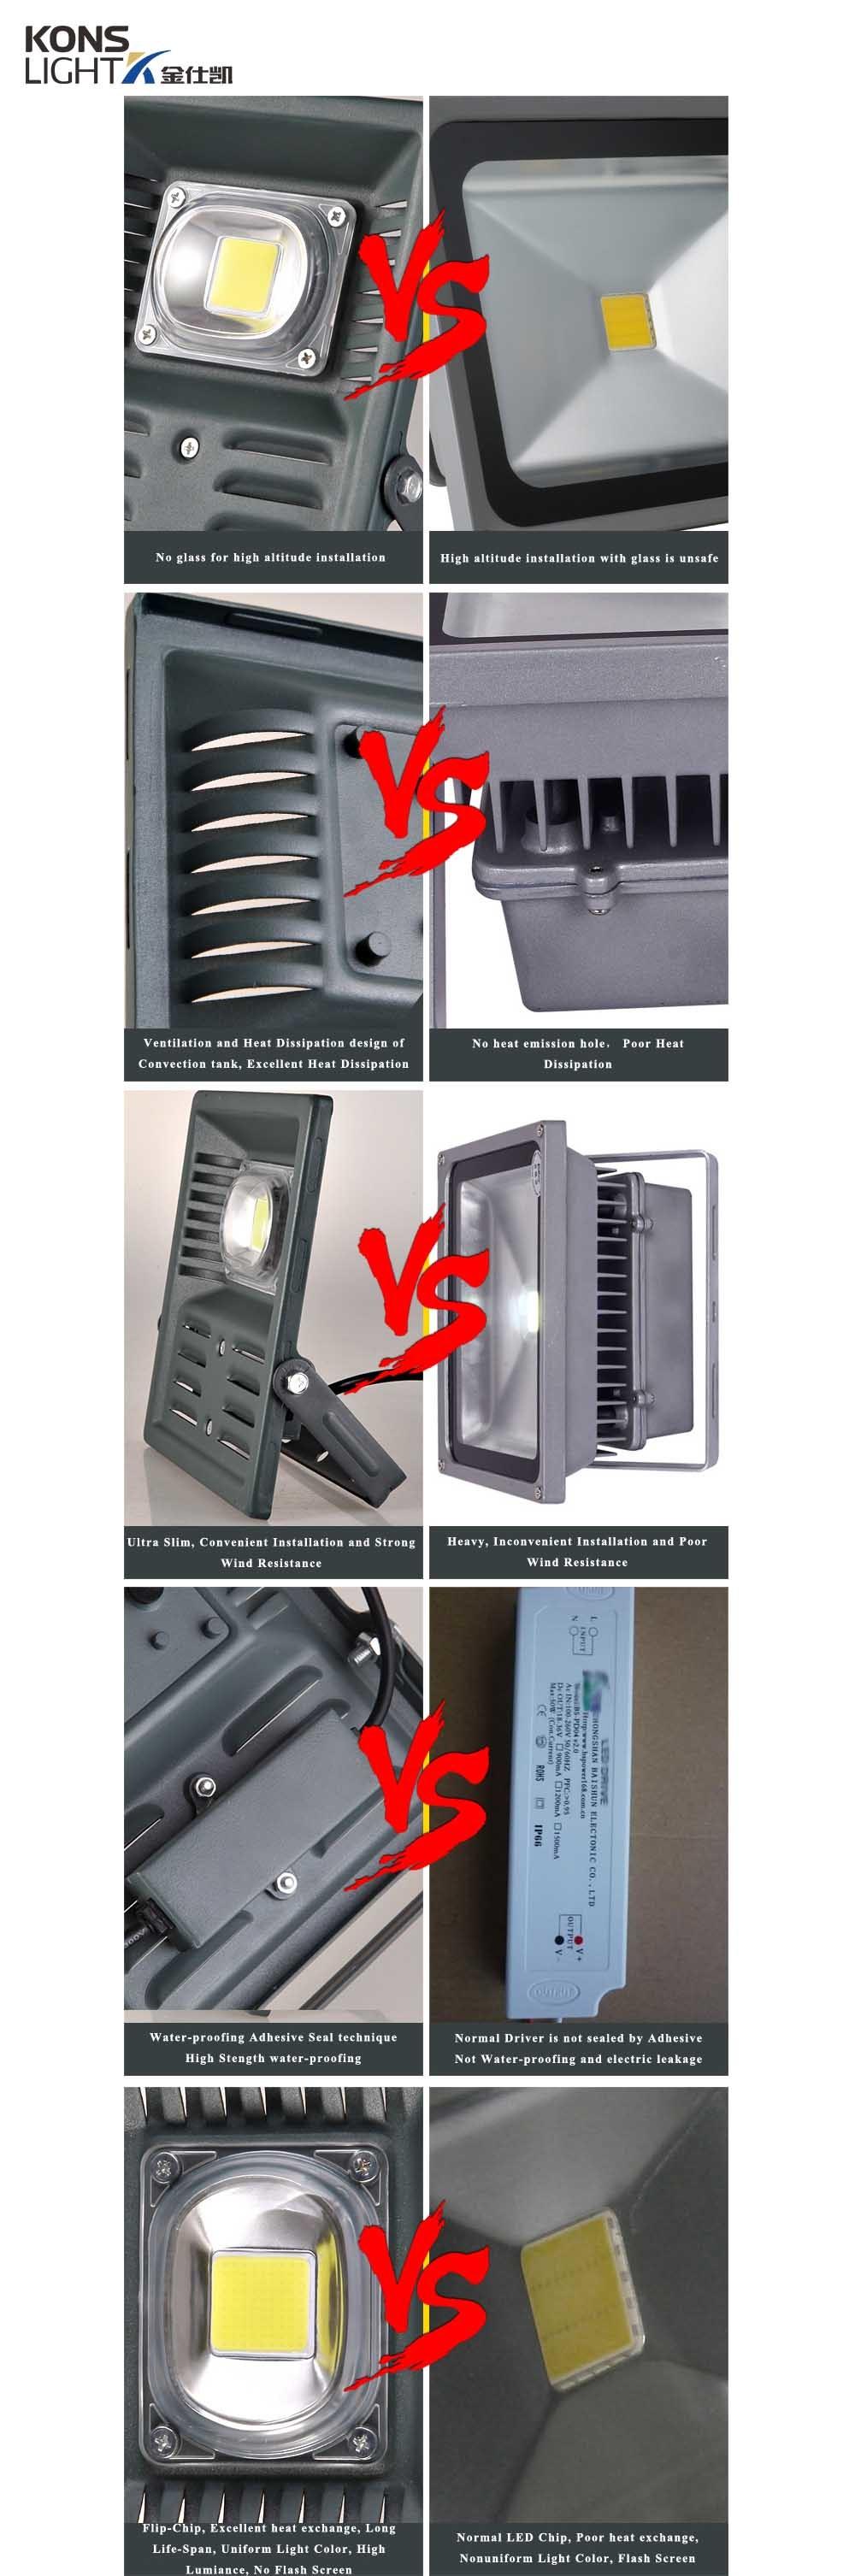 smd aluminium cob led flood light manufacturers Kons manufacture